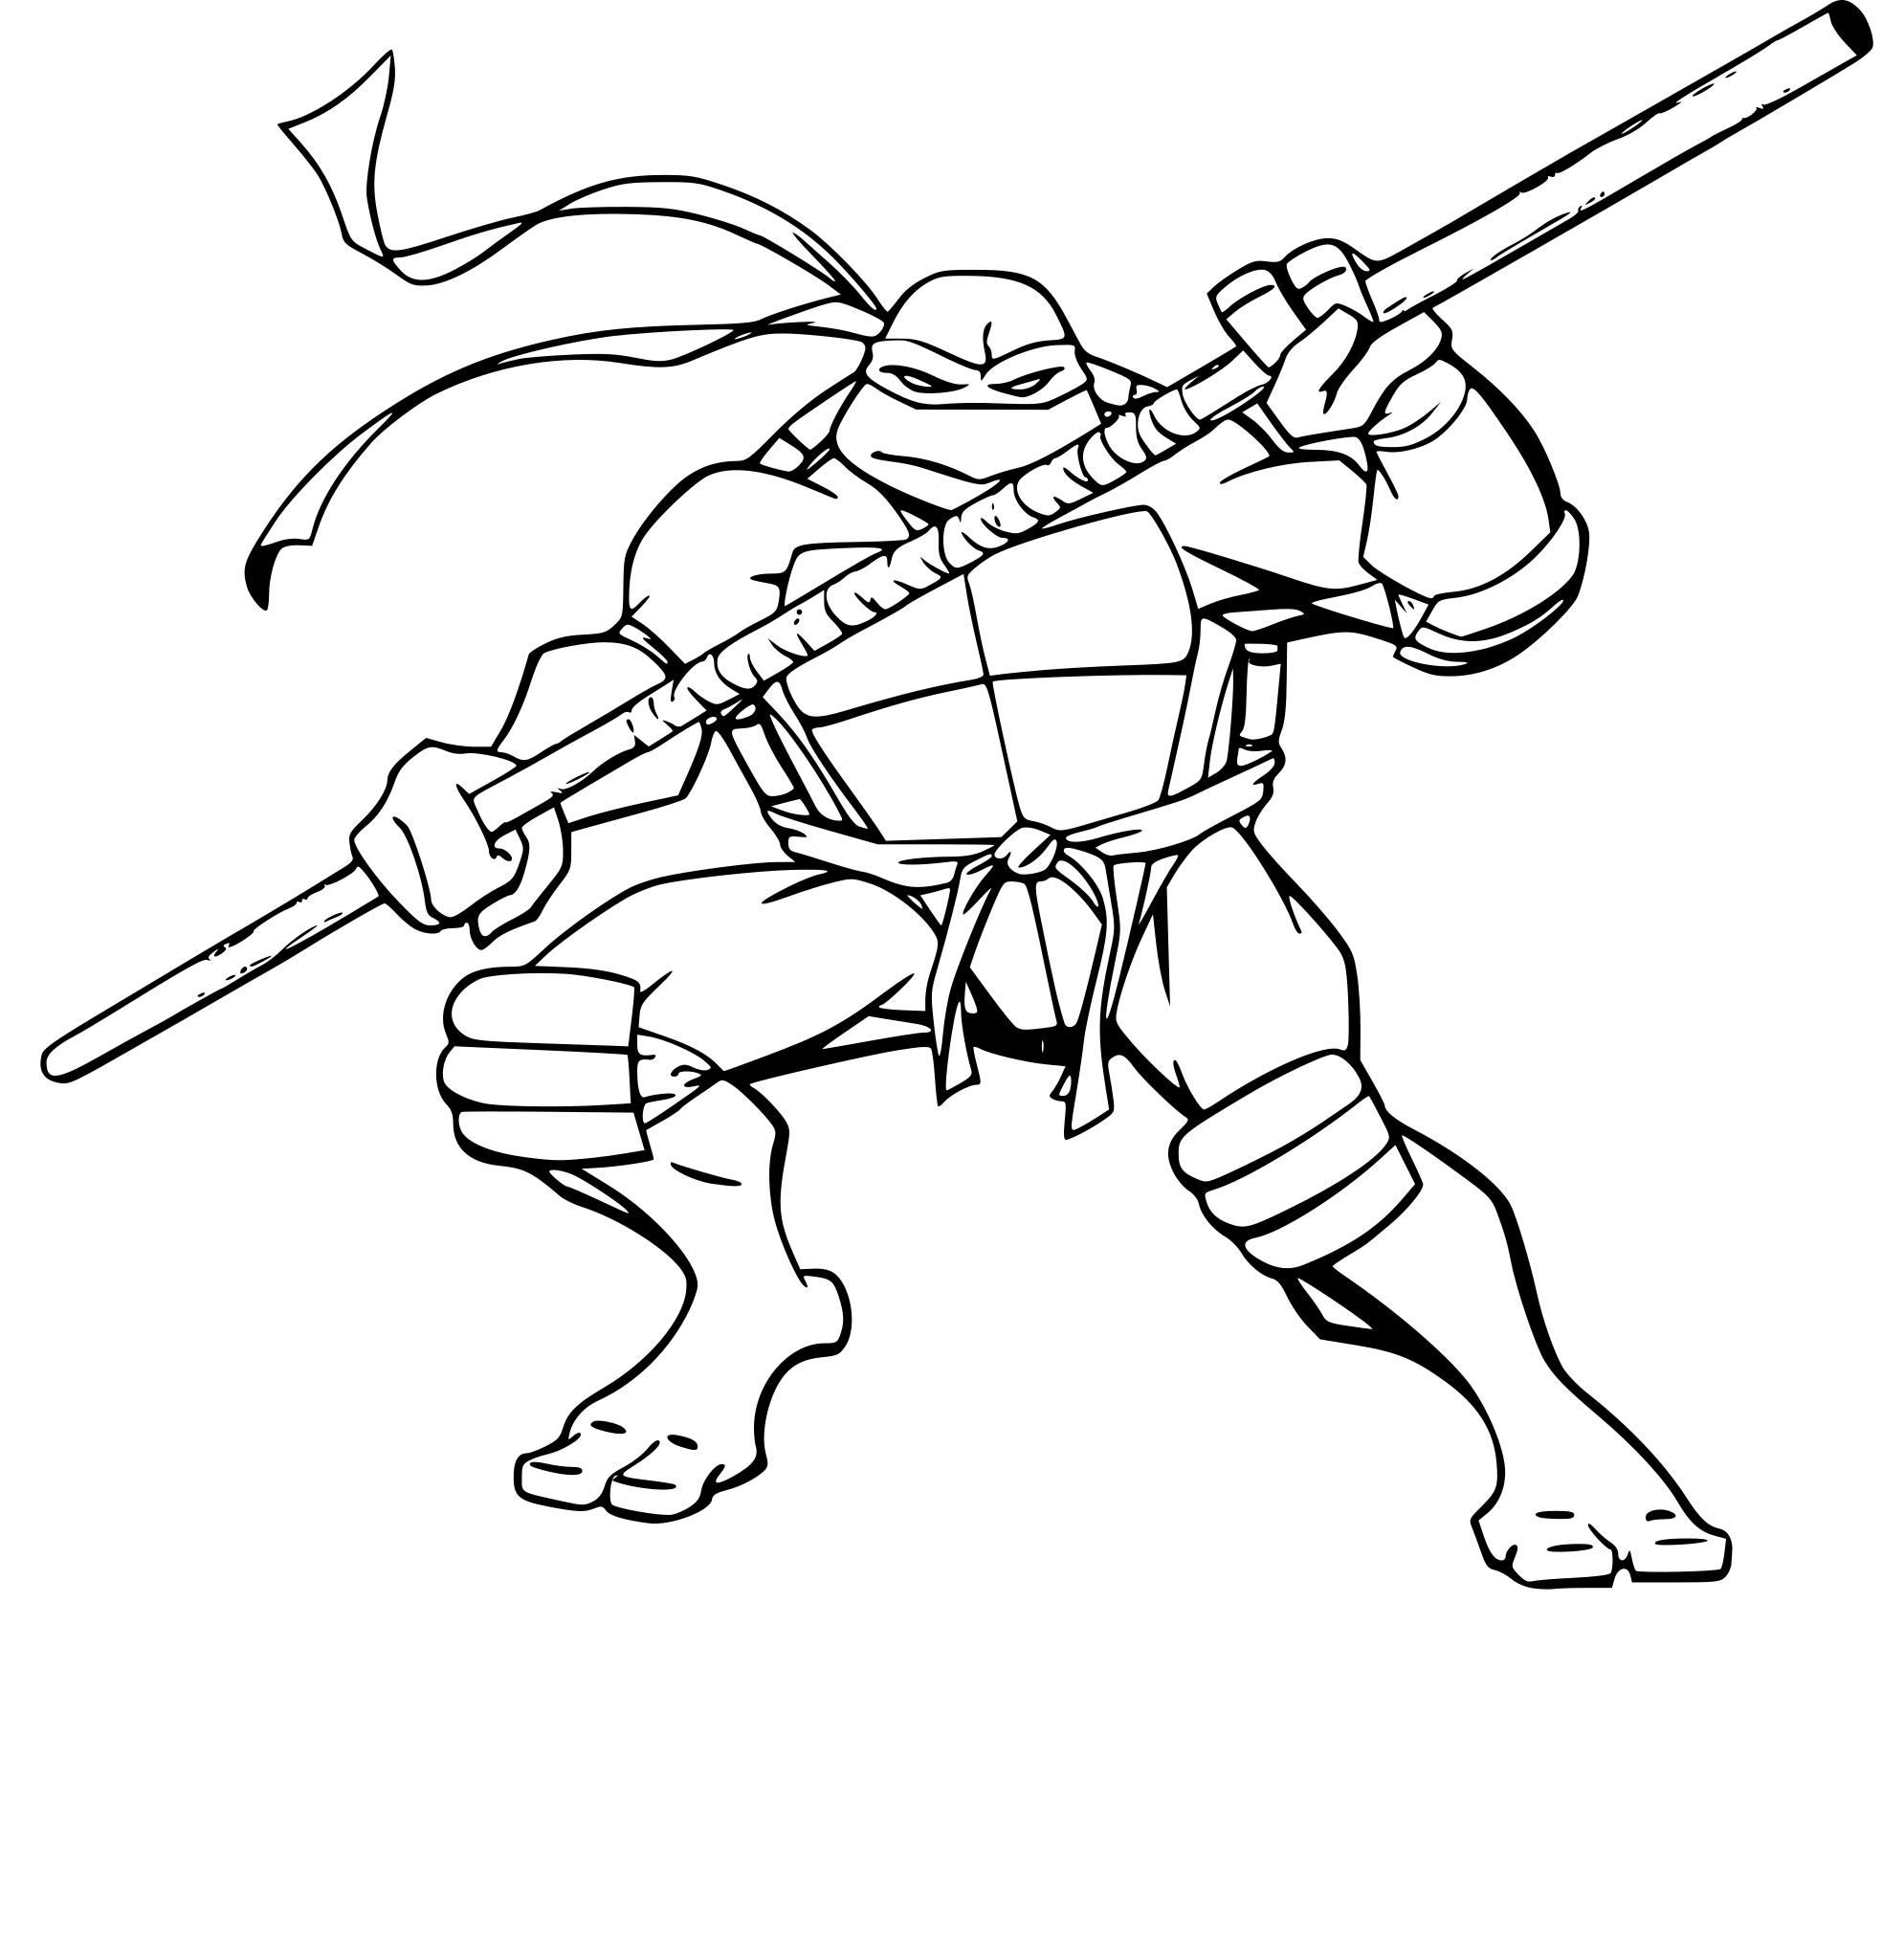 Coloriage Tortue Ninja Donatello À Imprimer Sur Coloriages pour Dessin De Tortue Ninja